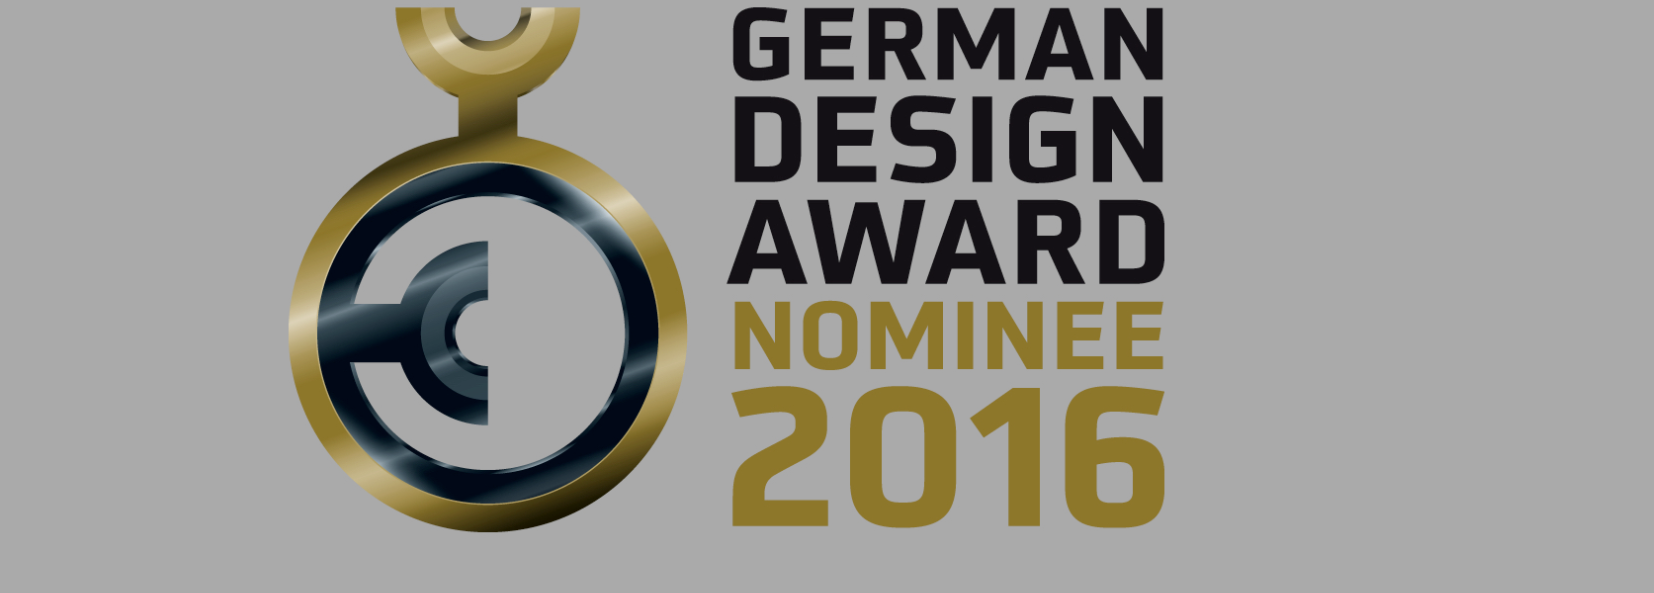 Nomination German Design Award